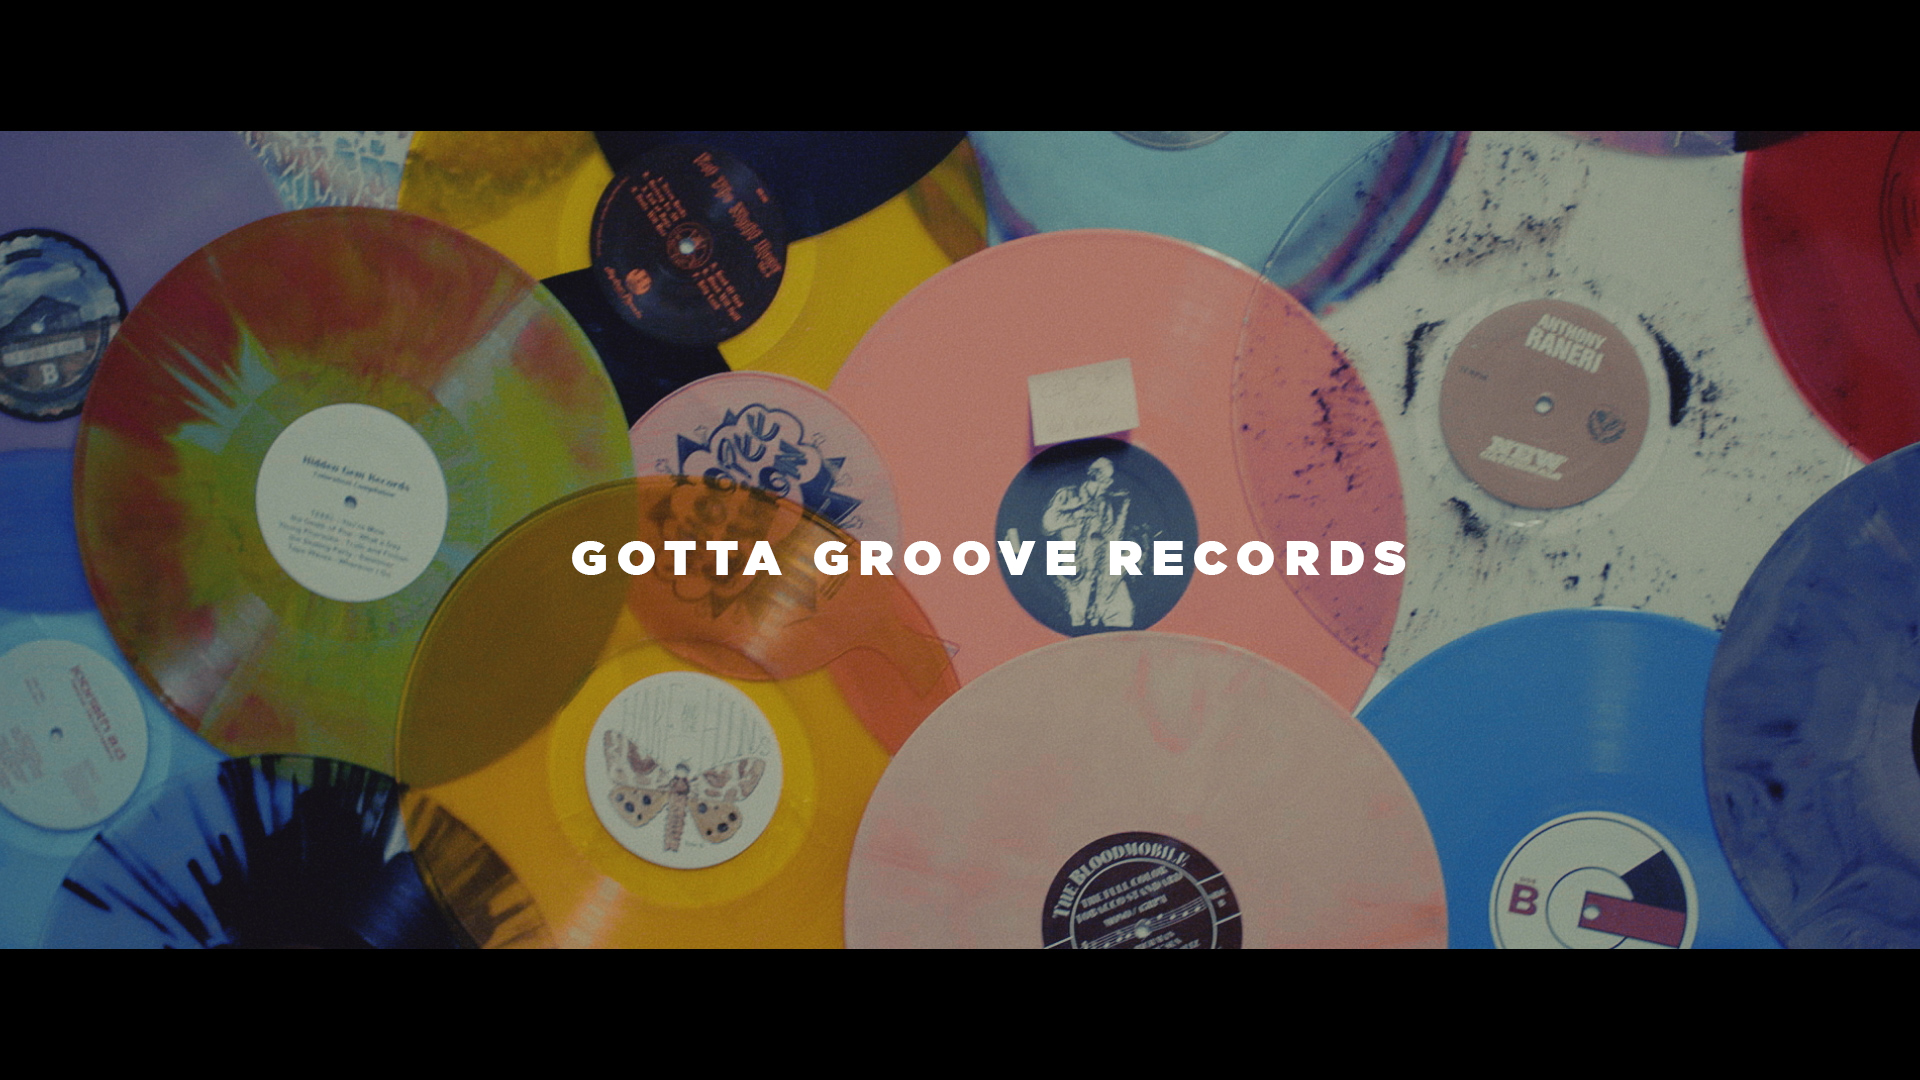 See How Gotta Groove Presses Gorgeous Vinyl Records